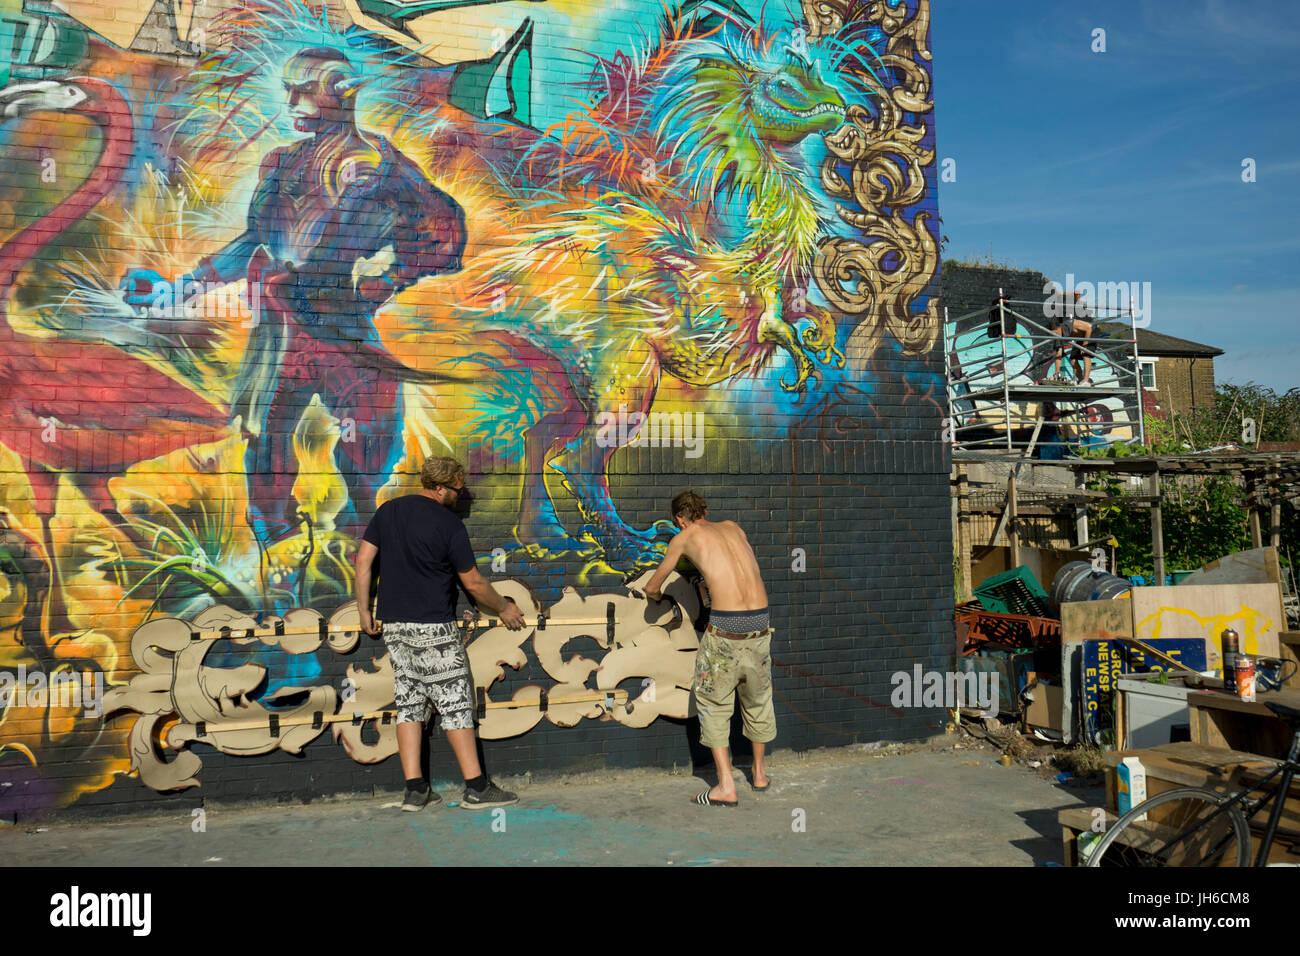 4ddbe8e3eba Graffiti artists at the Nomadic communal gardens space in Shoreditch ...